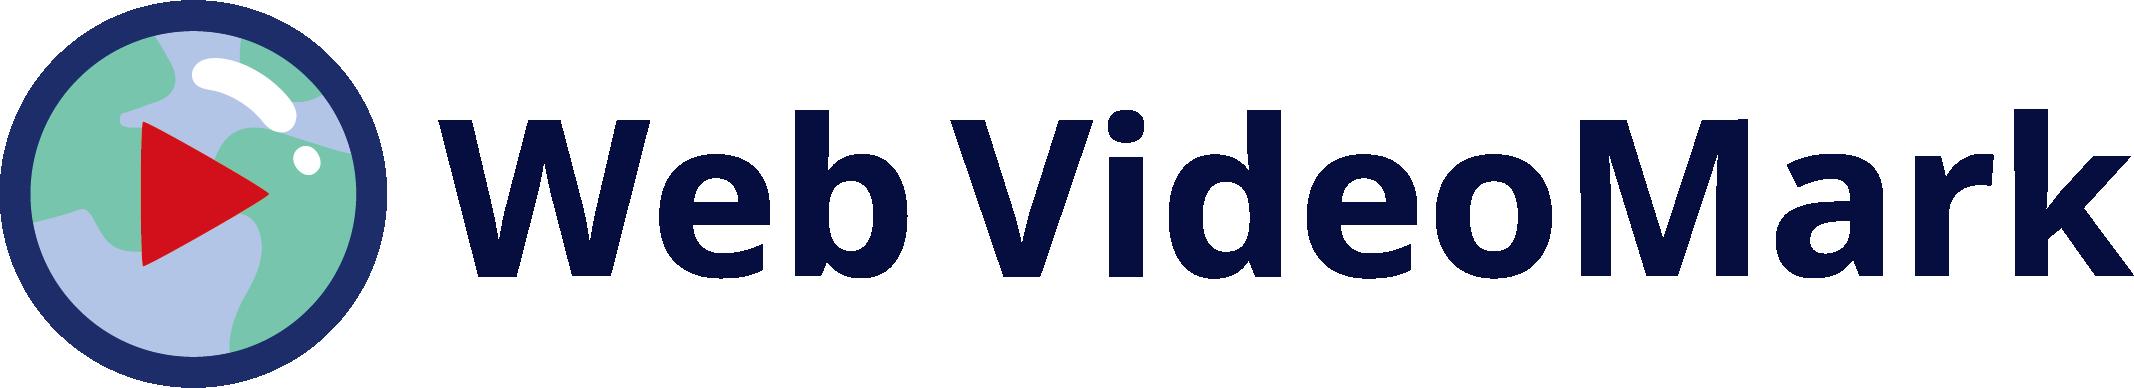 Web VideoMark